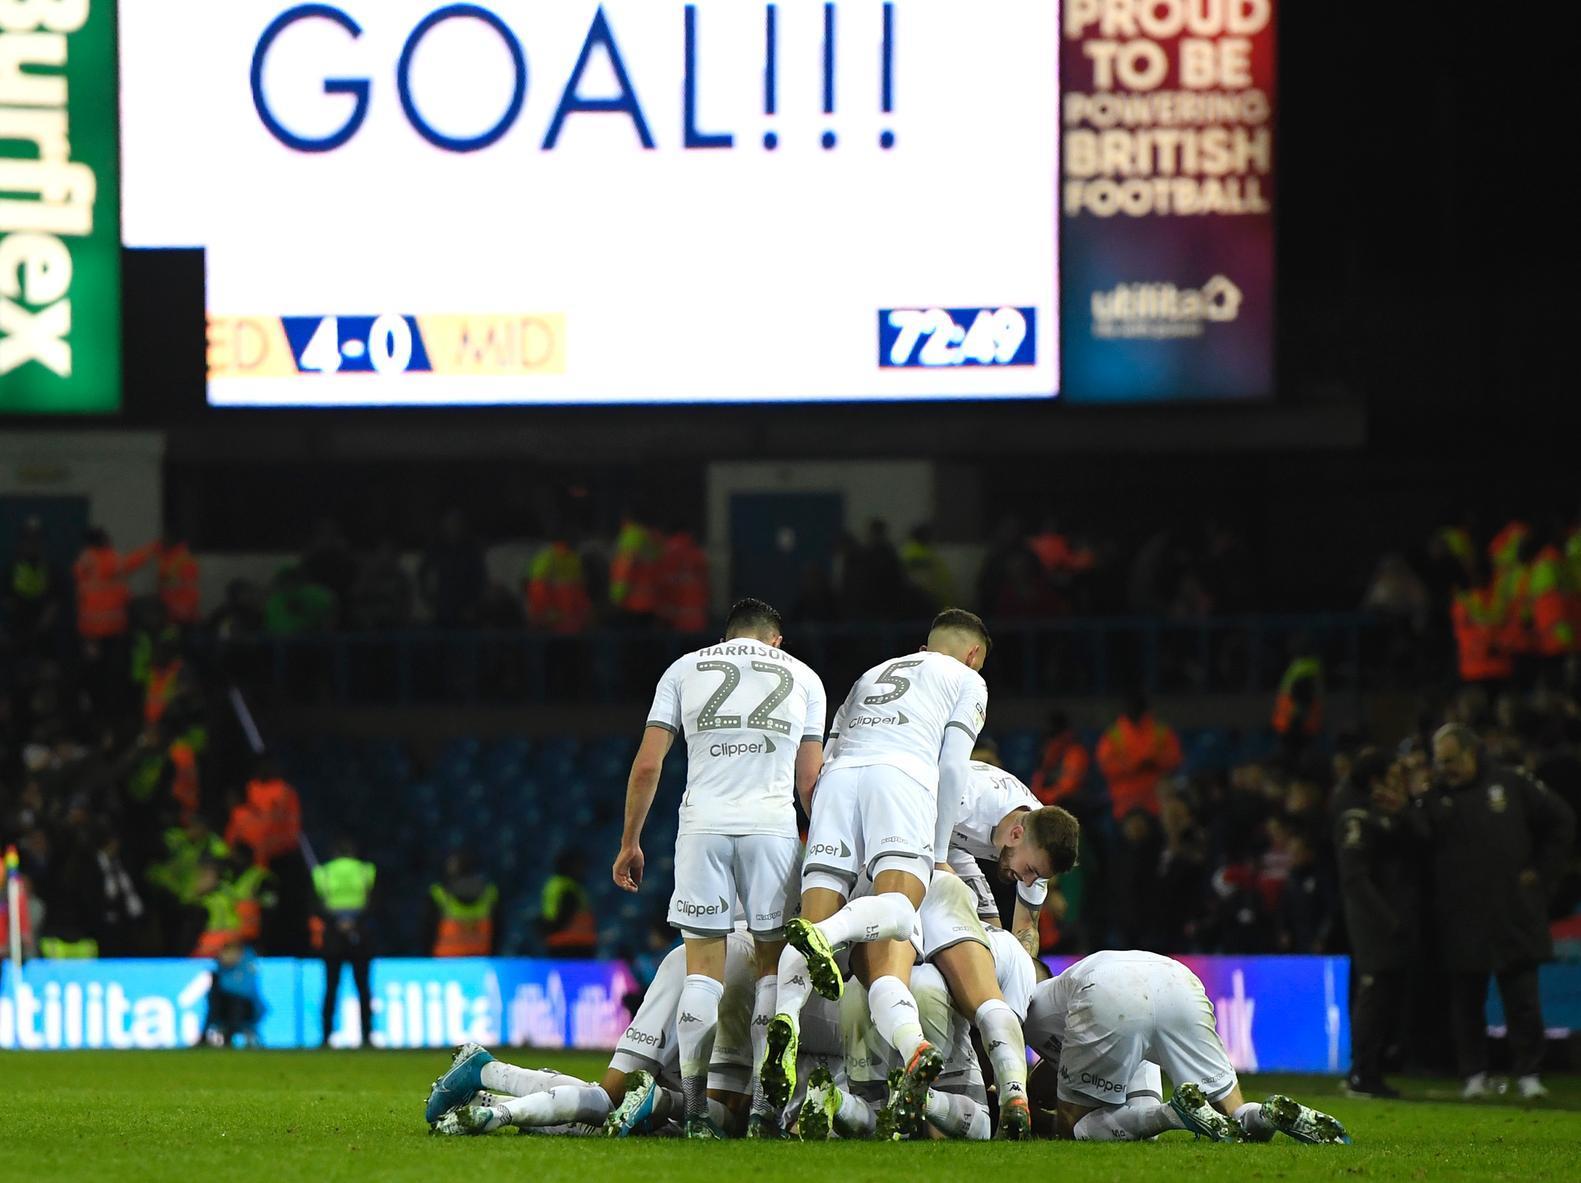 Leeds United 4 Middlesbrough 0 - Graham Smyth's player ratings: Whites produced scintillating Elland Road display